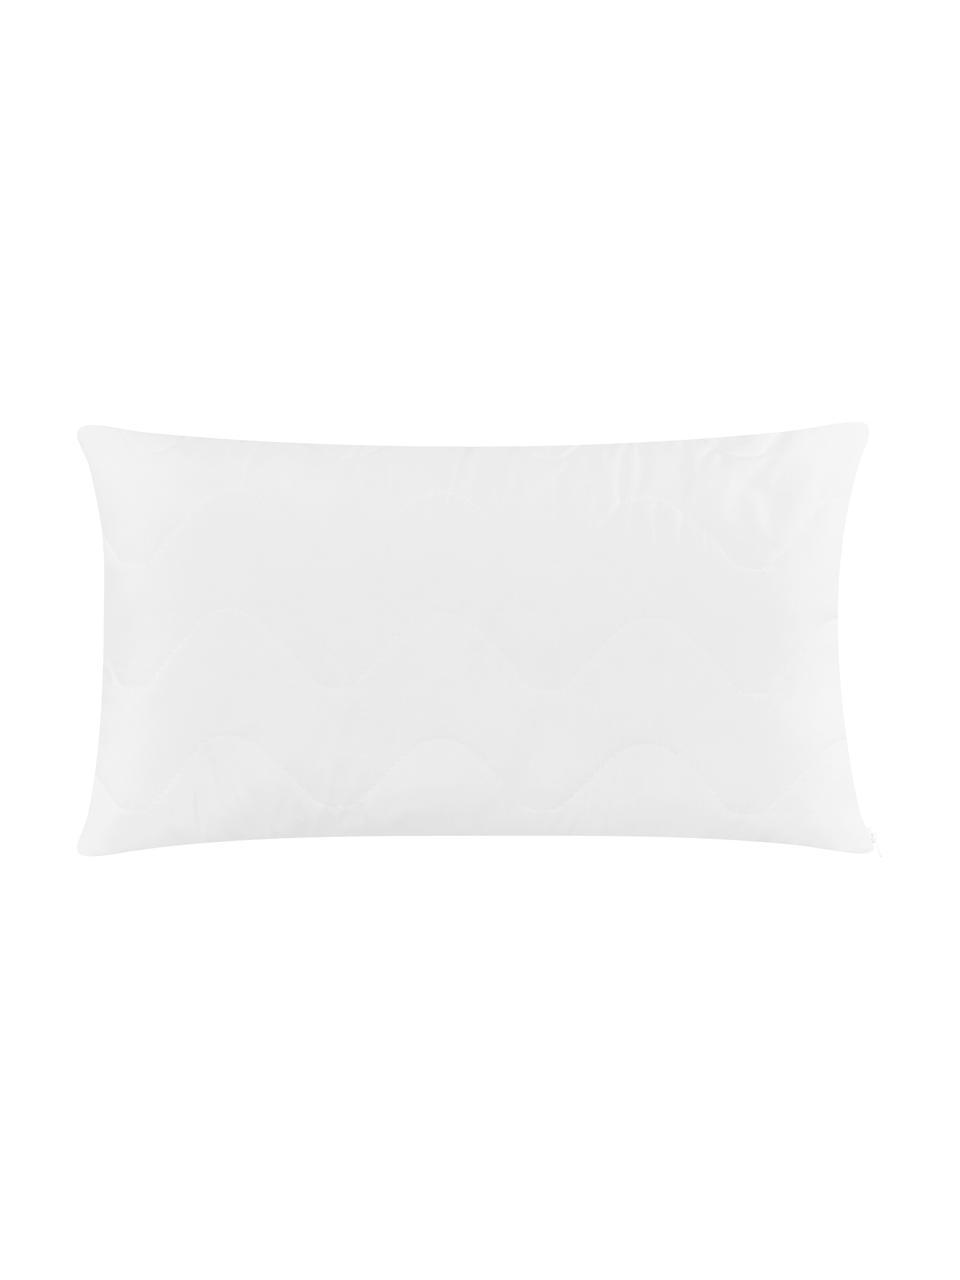 Premium kussenvulling Sia, 30x50, microvezel vulling, Wit, 30 x 50 cm